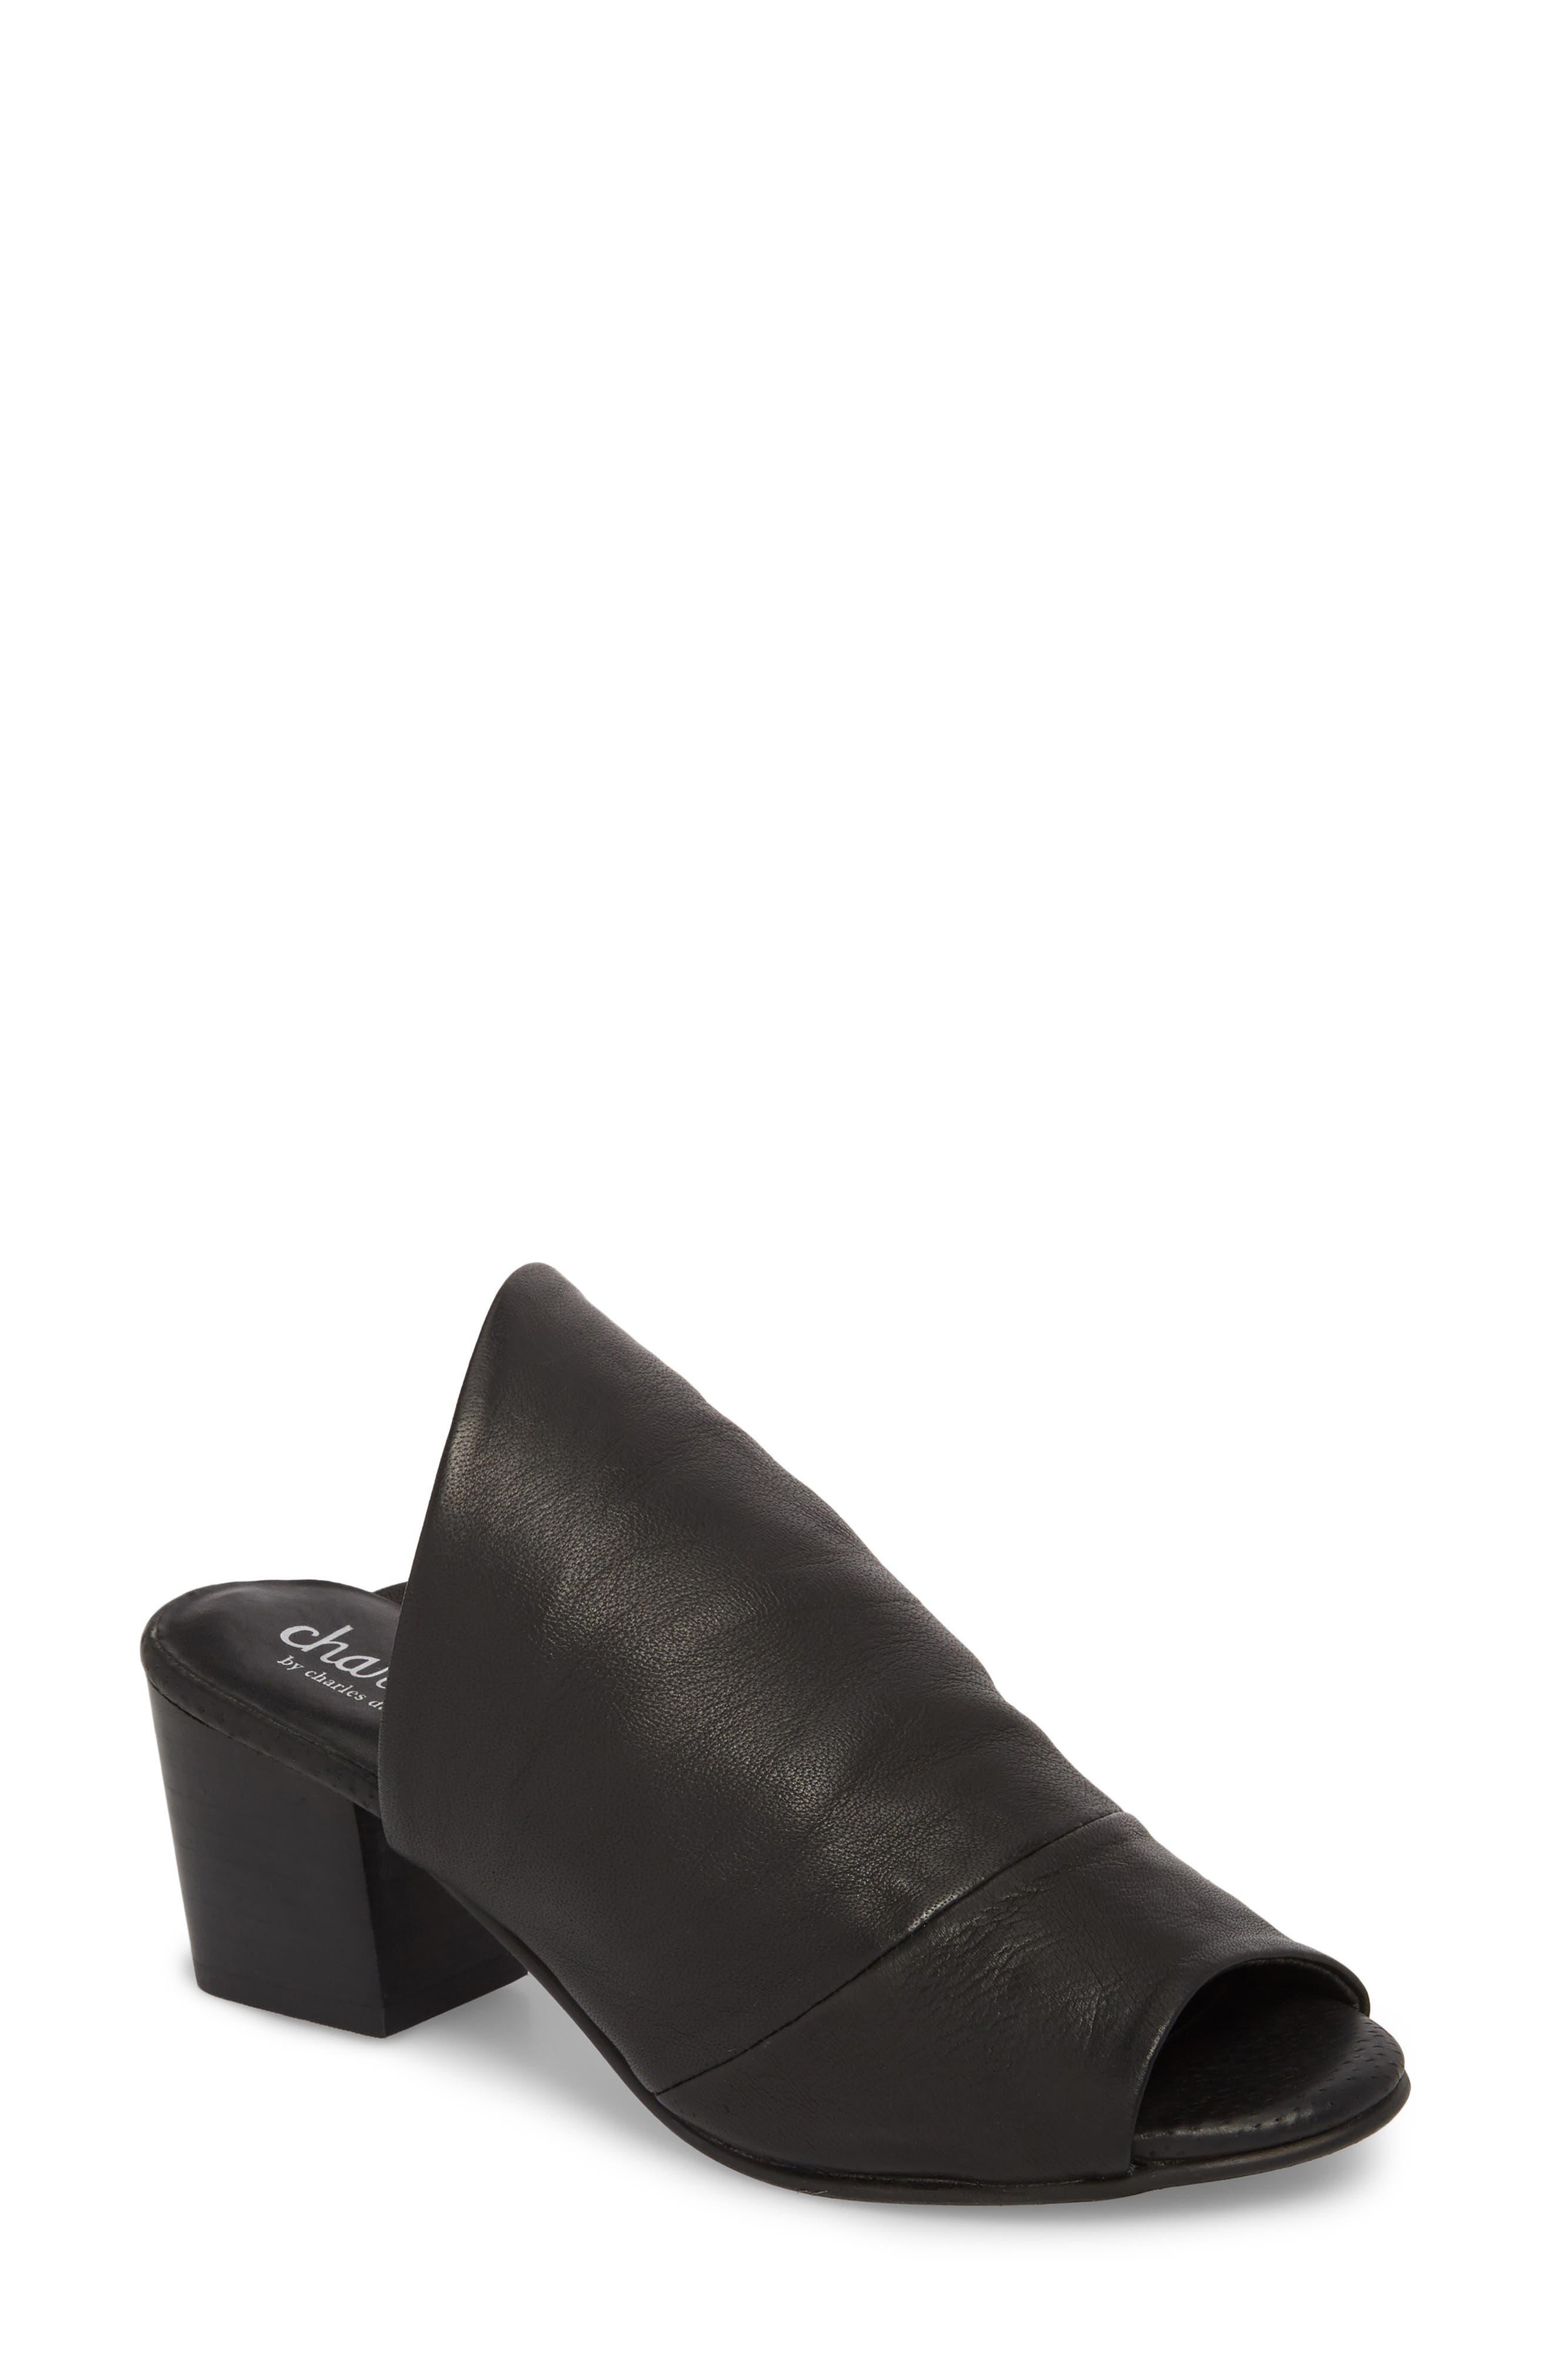 Yanna Block Heel Slide Sandal,                             Main thumbnail 1, color,                             BLACK LEATHER